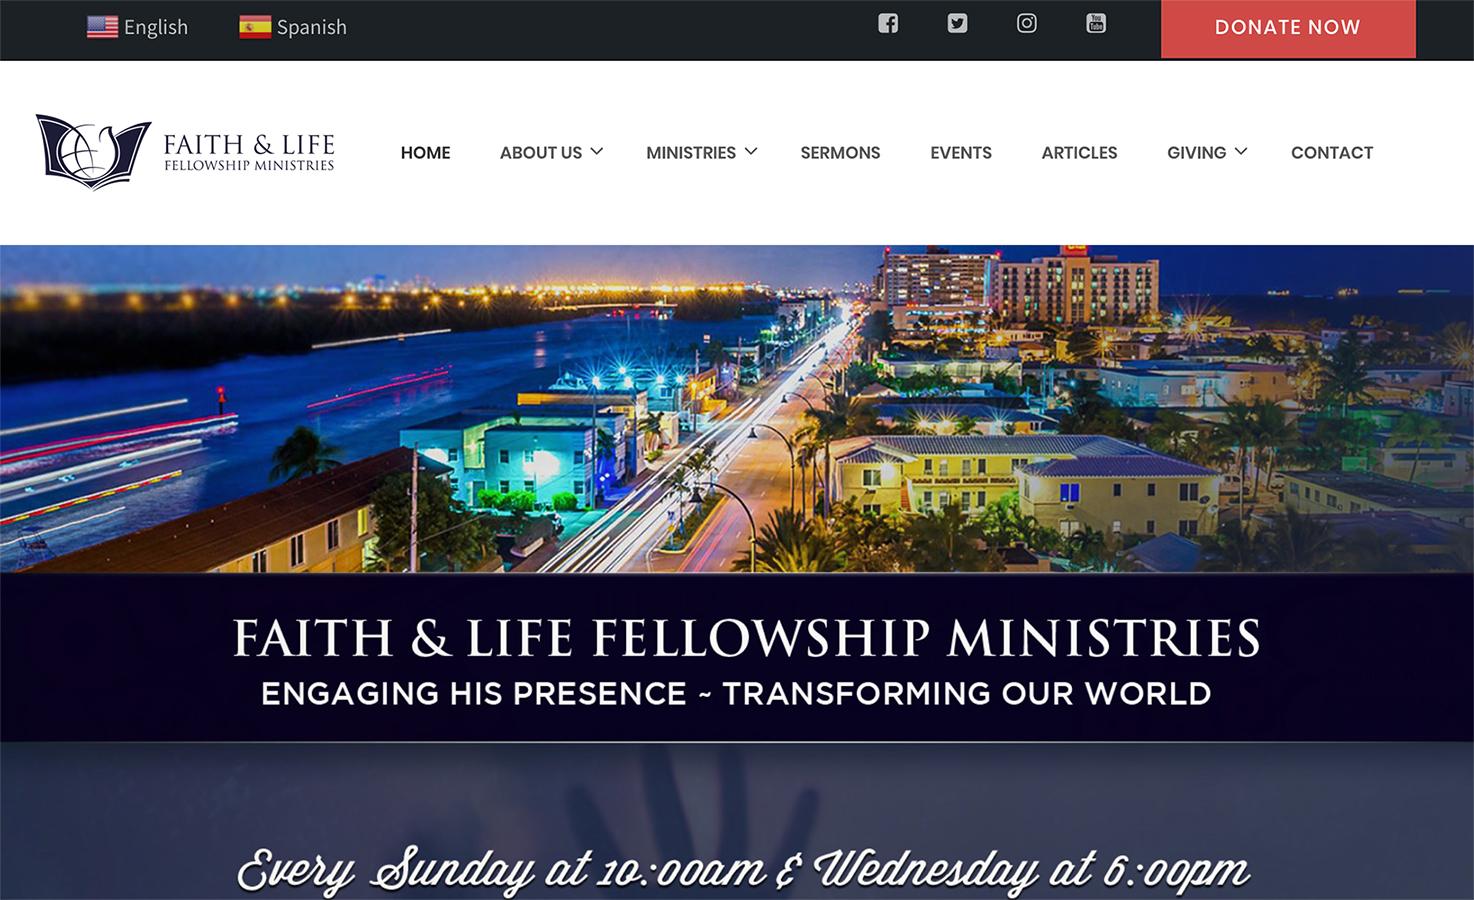 Home - Faith & Life Fellowship Ministries